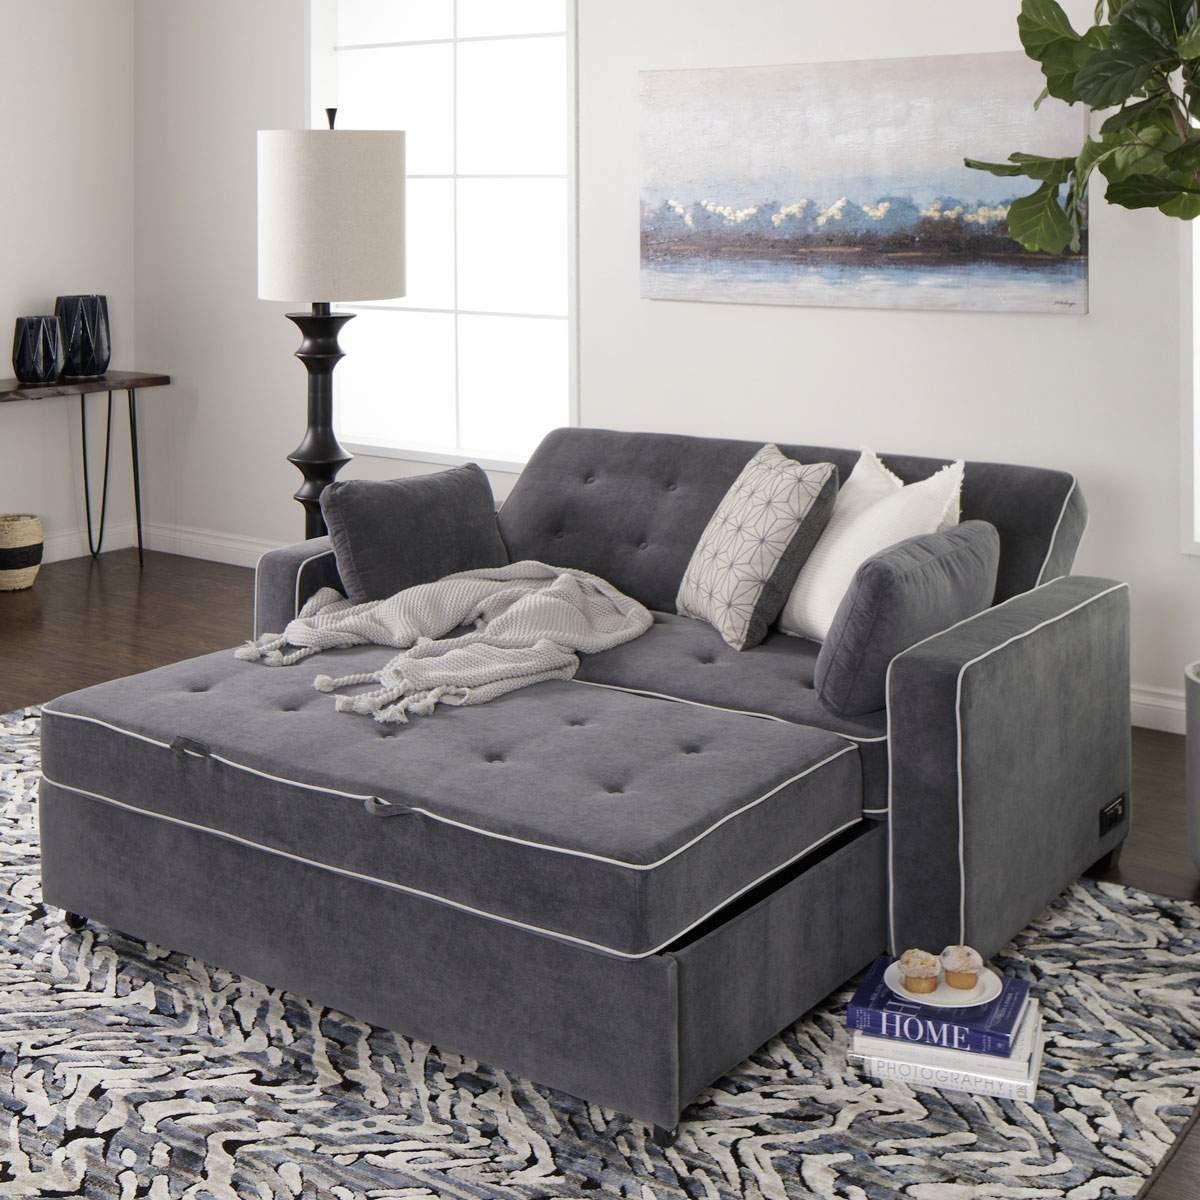 Carlton   Queen size sleeper sofa, Pull out sleeper sofa ...